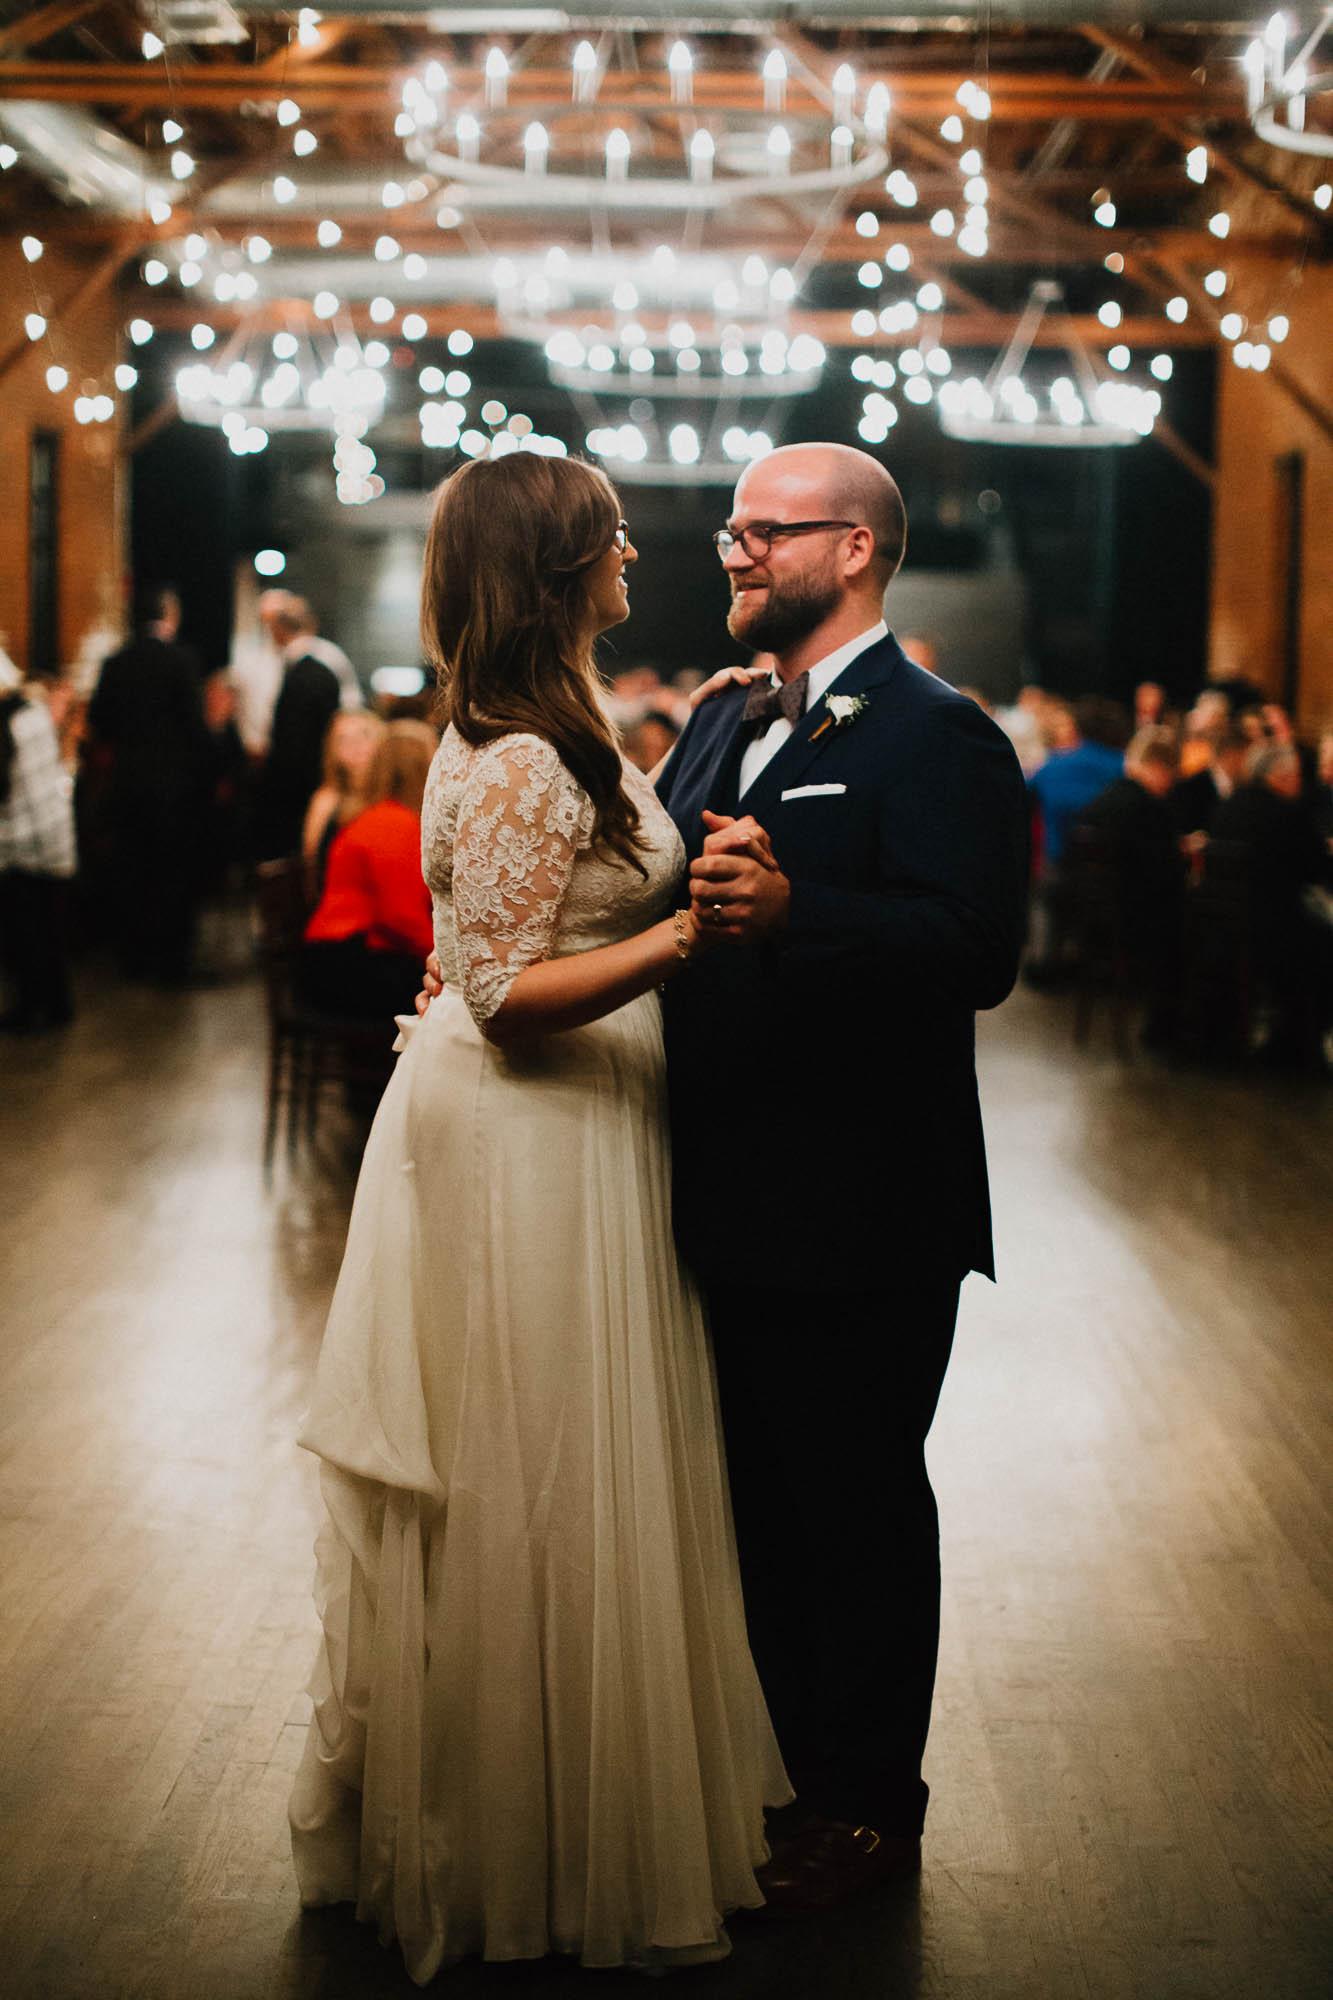 Highline-Car-House-Wedding-Columbus-Kristin-Aaron-111.jpg